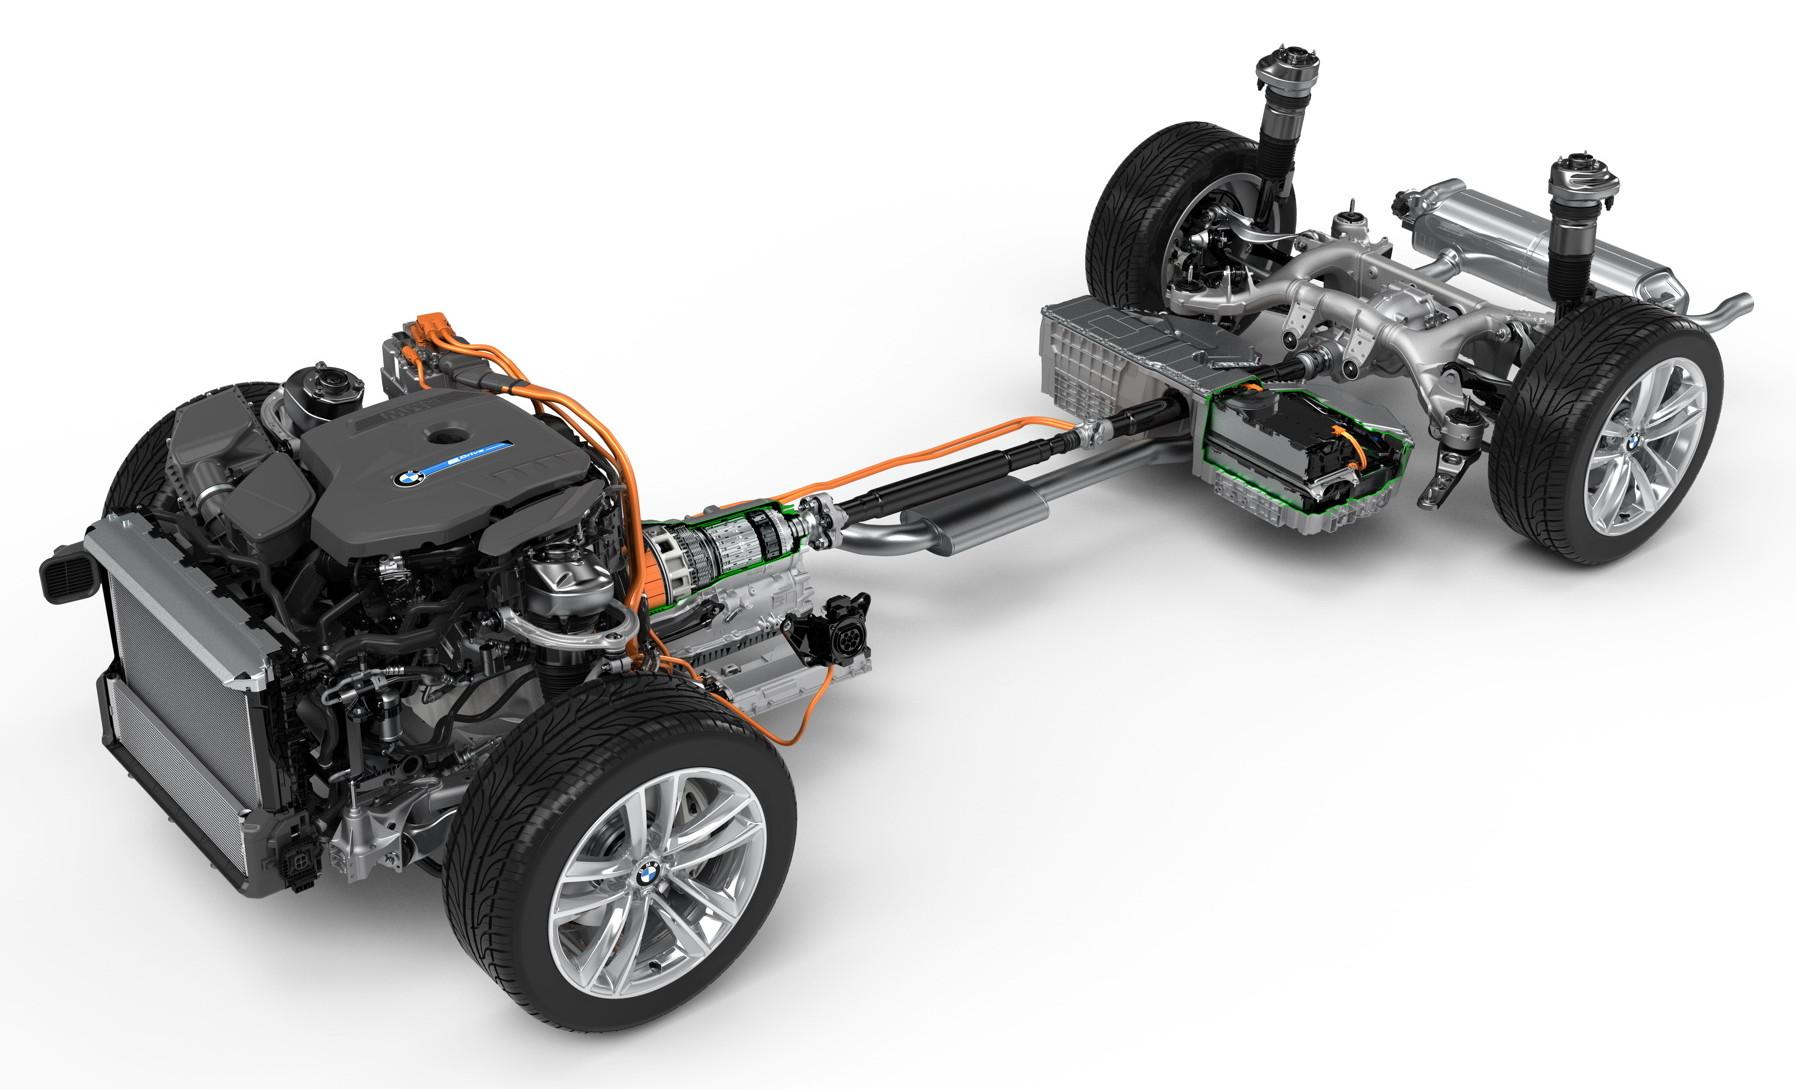 small resolution of bmw i8 engine diagram wiring diagrams bmw i3 bmw i8 engine diagram